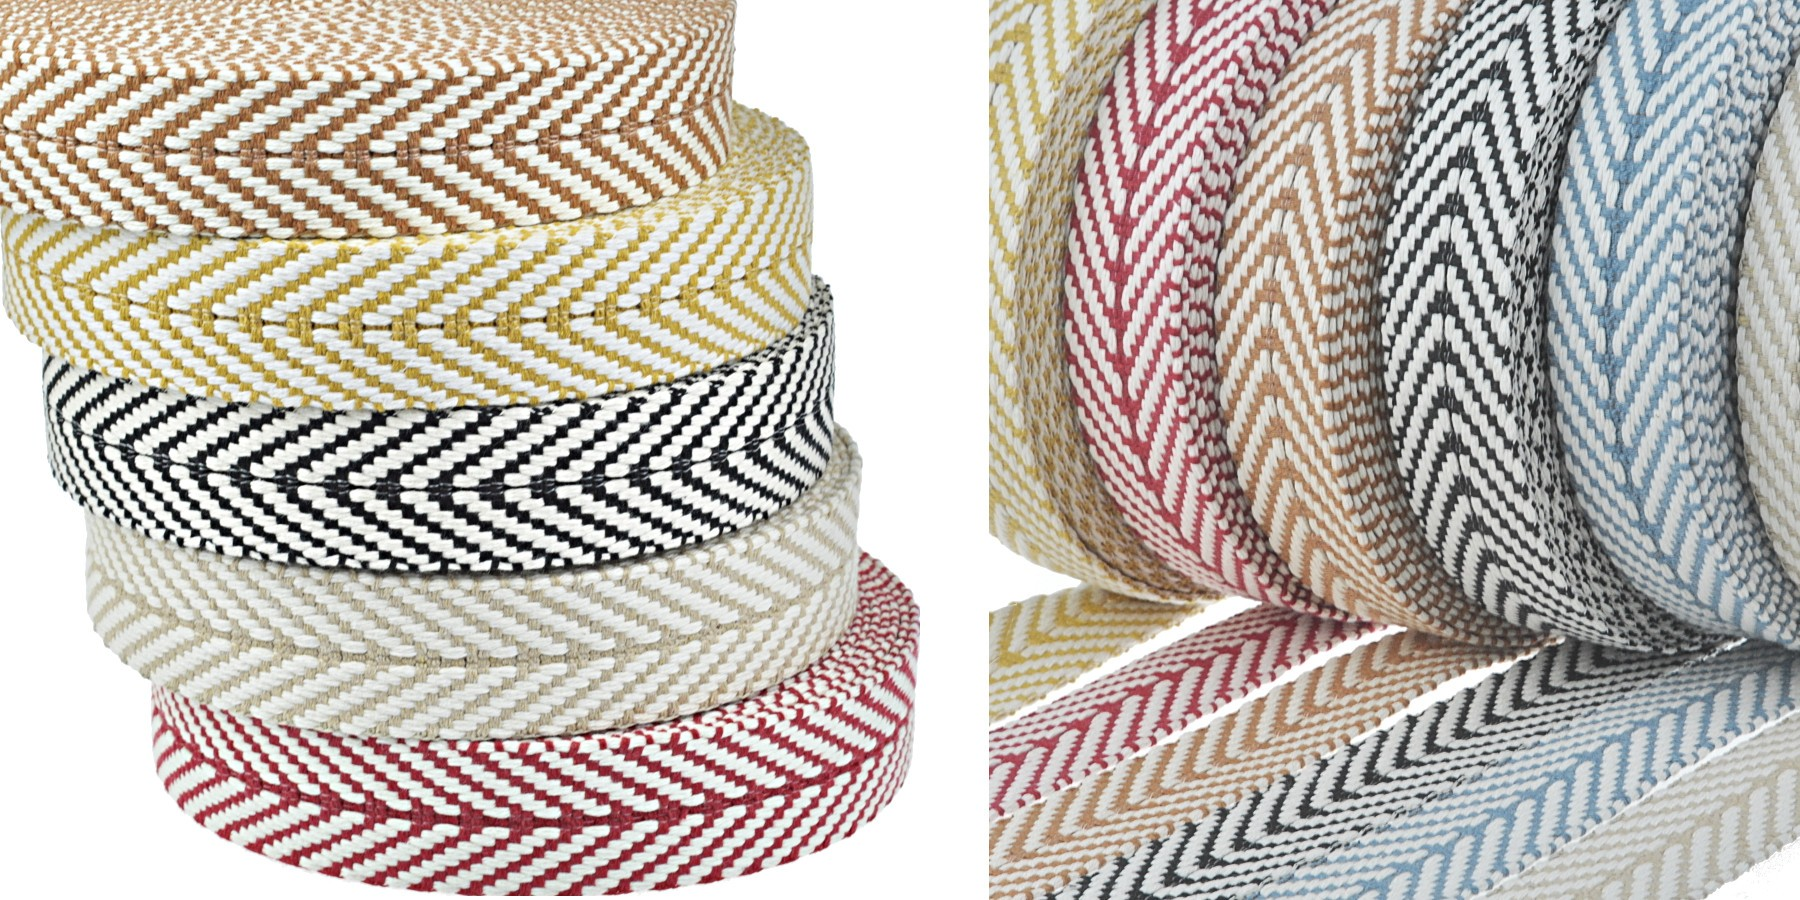 Gurtband aus recycelter Baumwolle